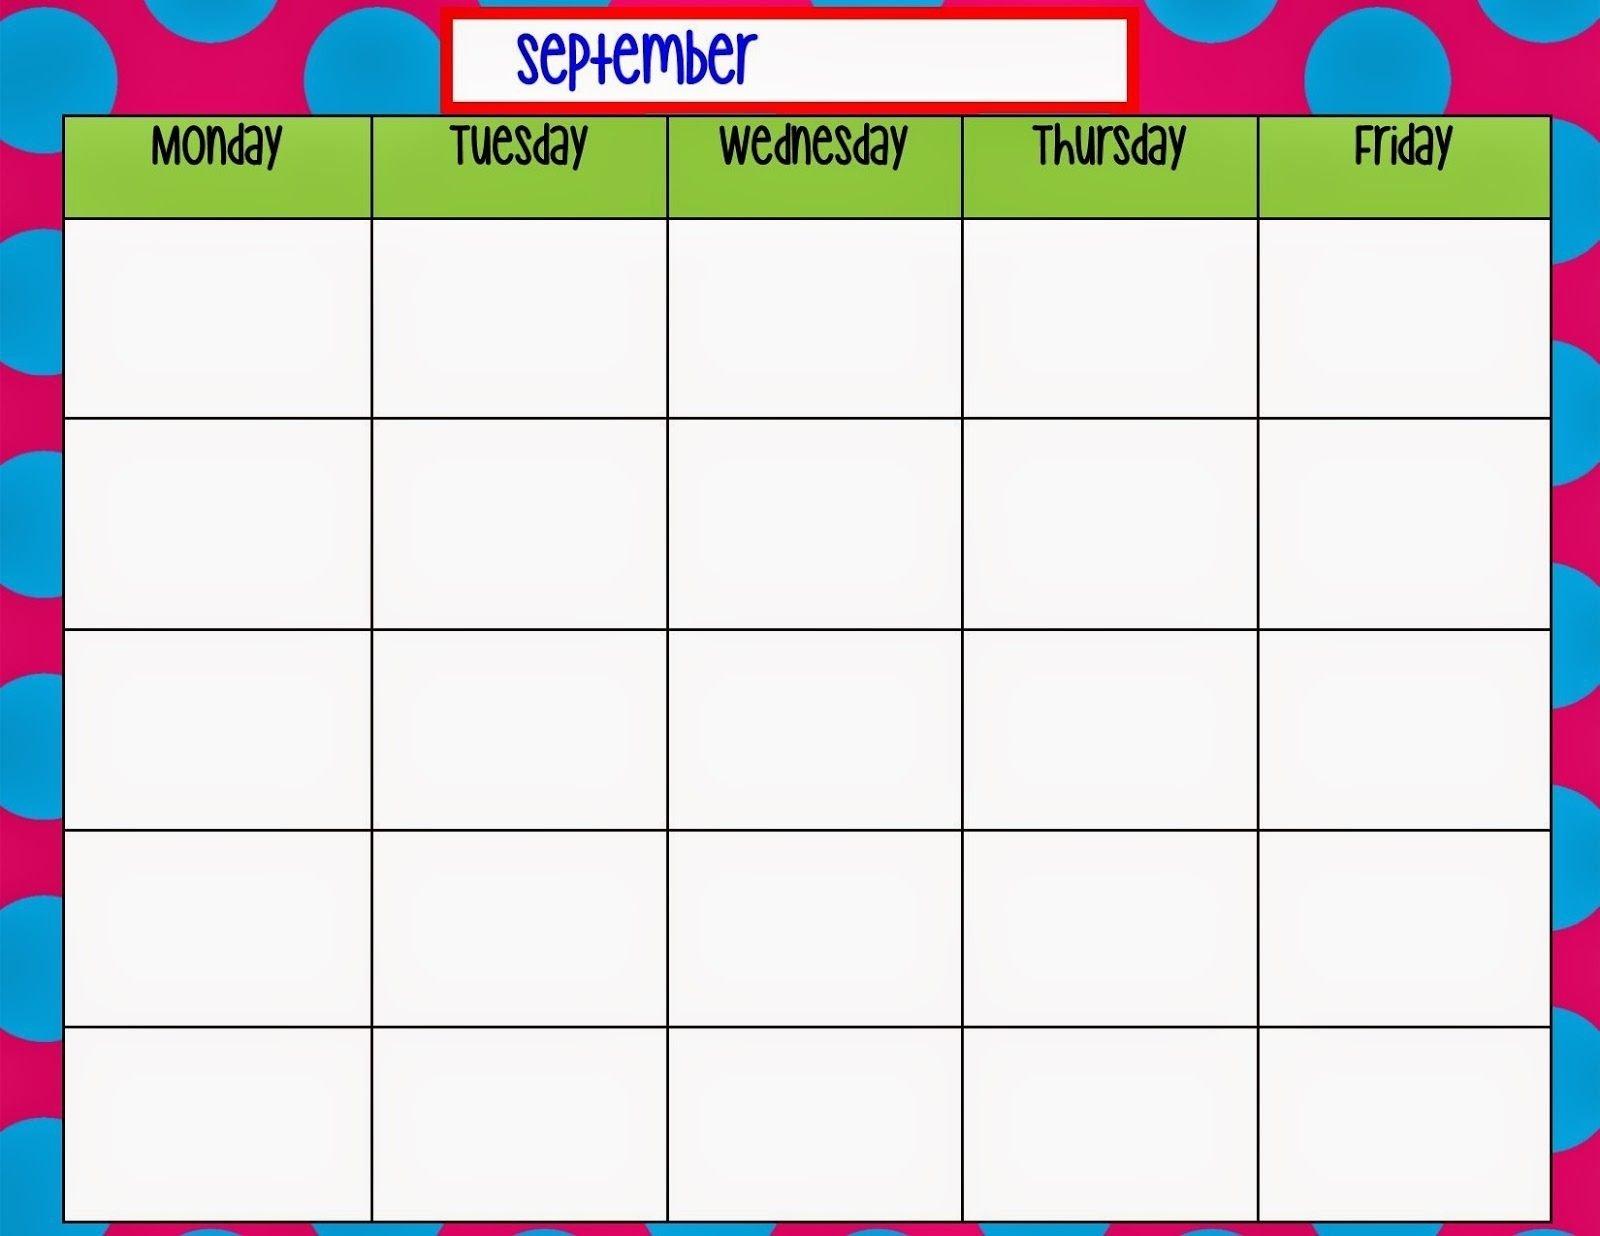 Free Printable Weekly Calendar Monday To Friday – Template Weekly Schedule Template Monday Friday